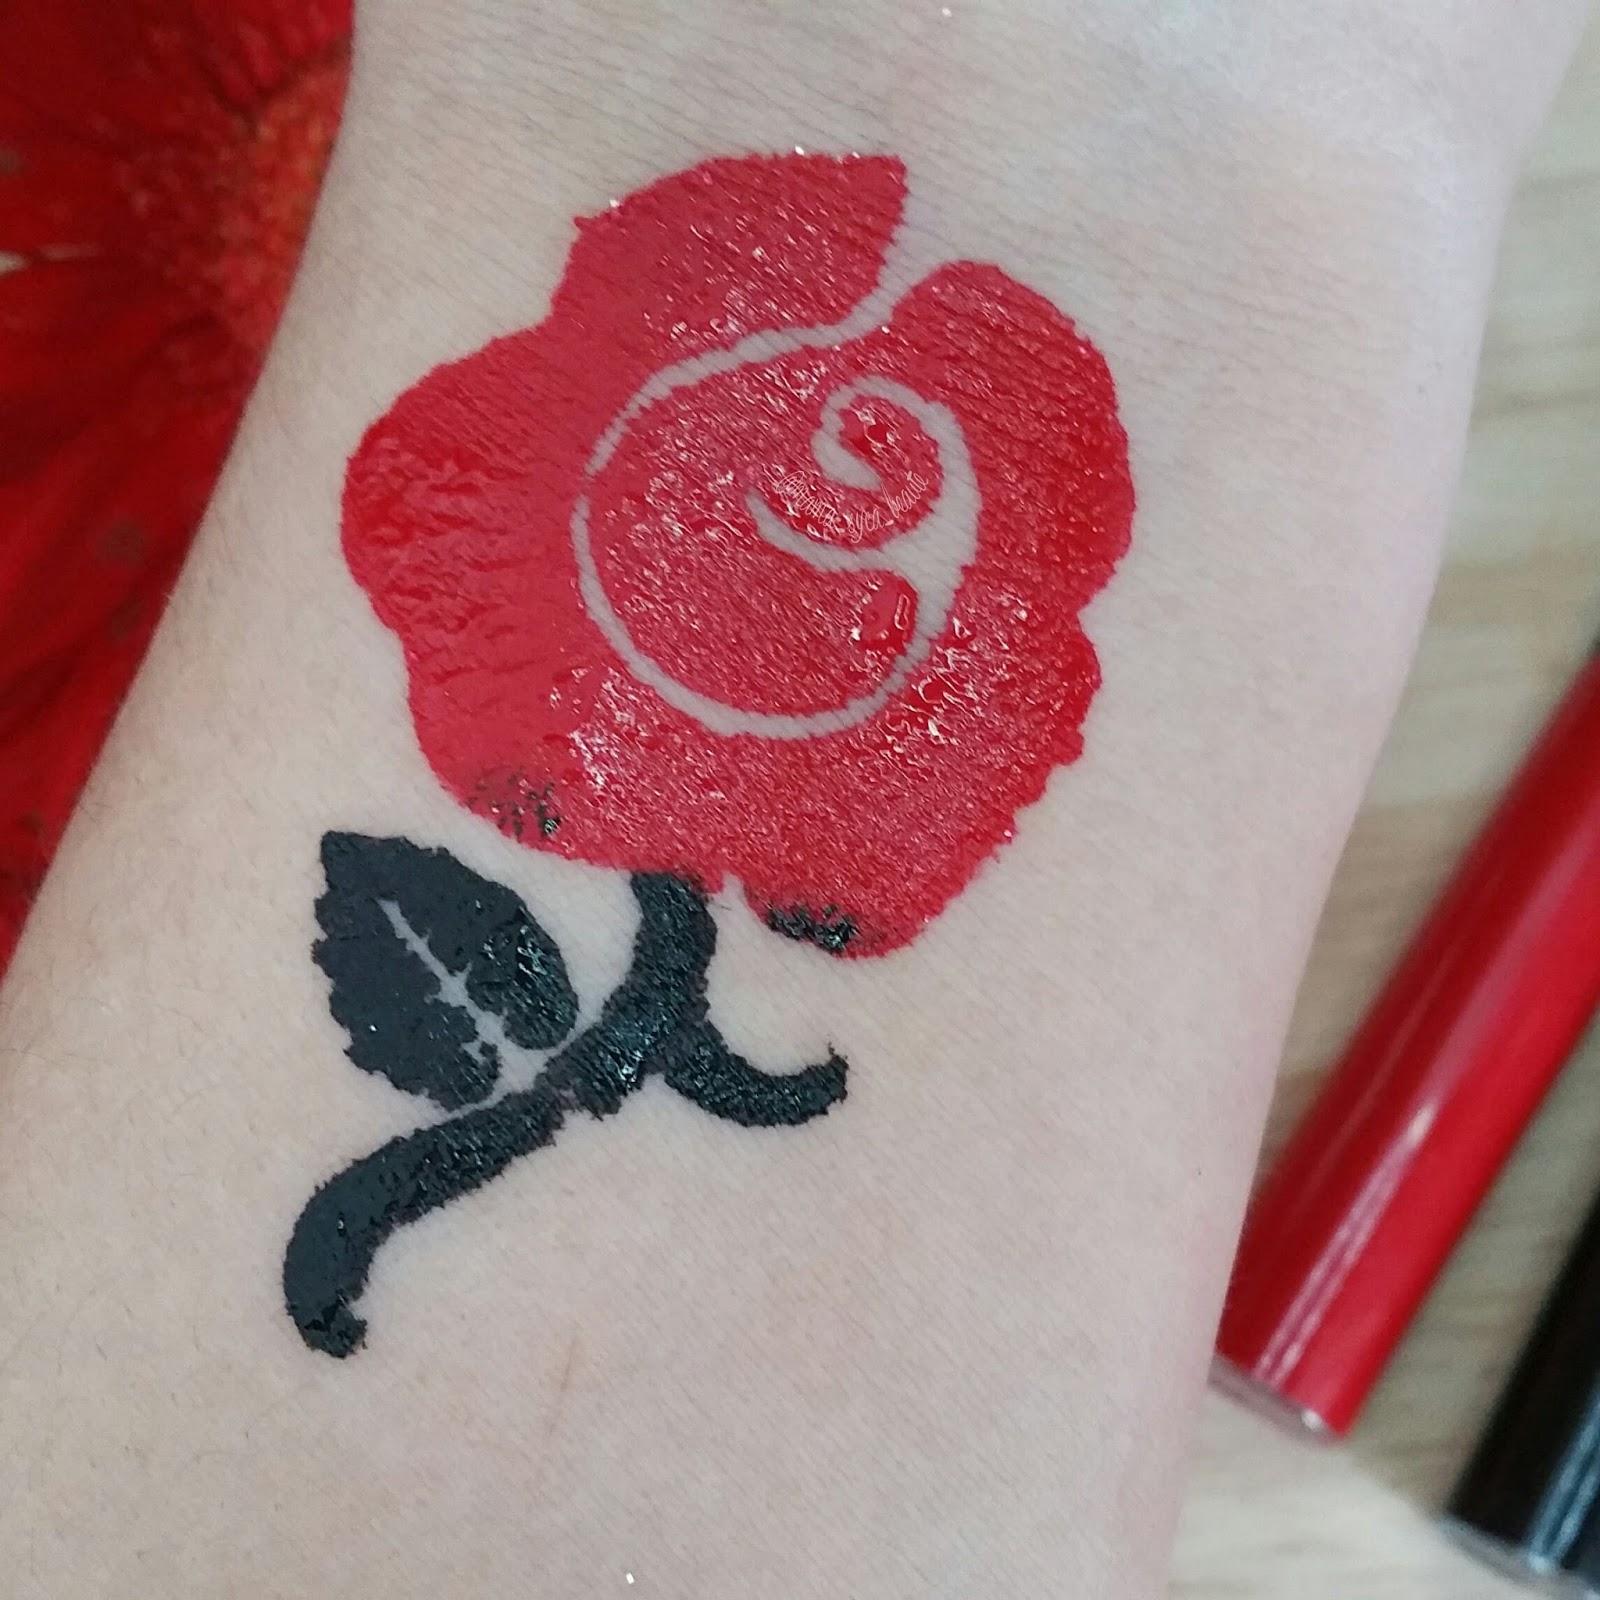 avis_rouge_veloute_sans_transfert_cream_lip_stain_sephora_swatch_code_promo_mama_syca_beaute